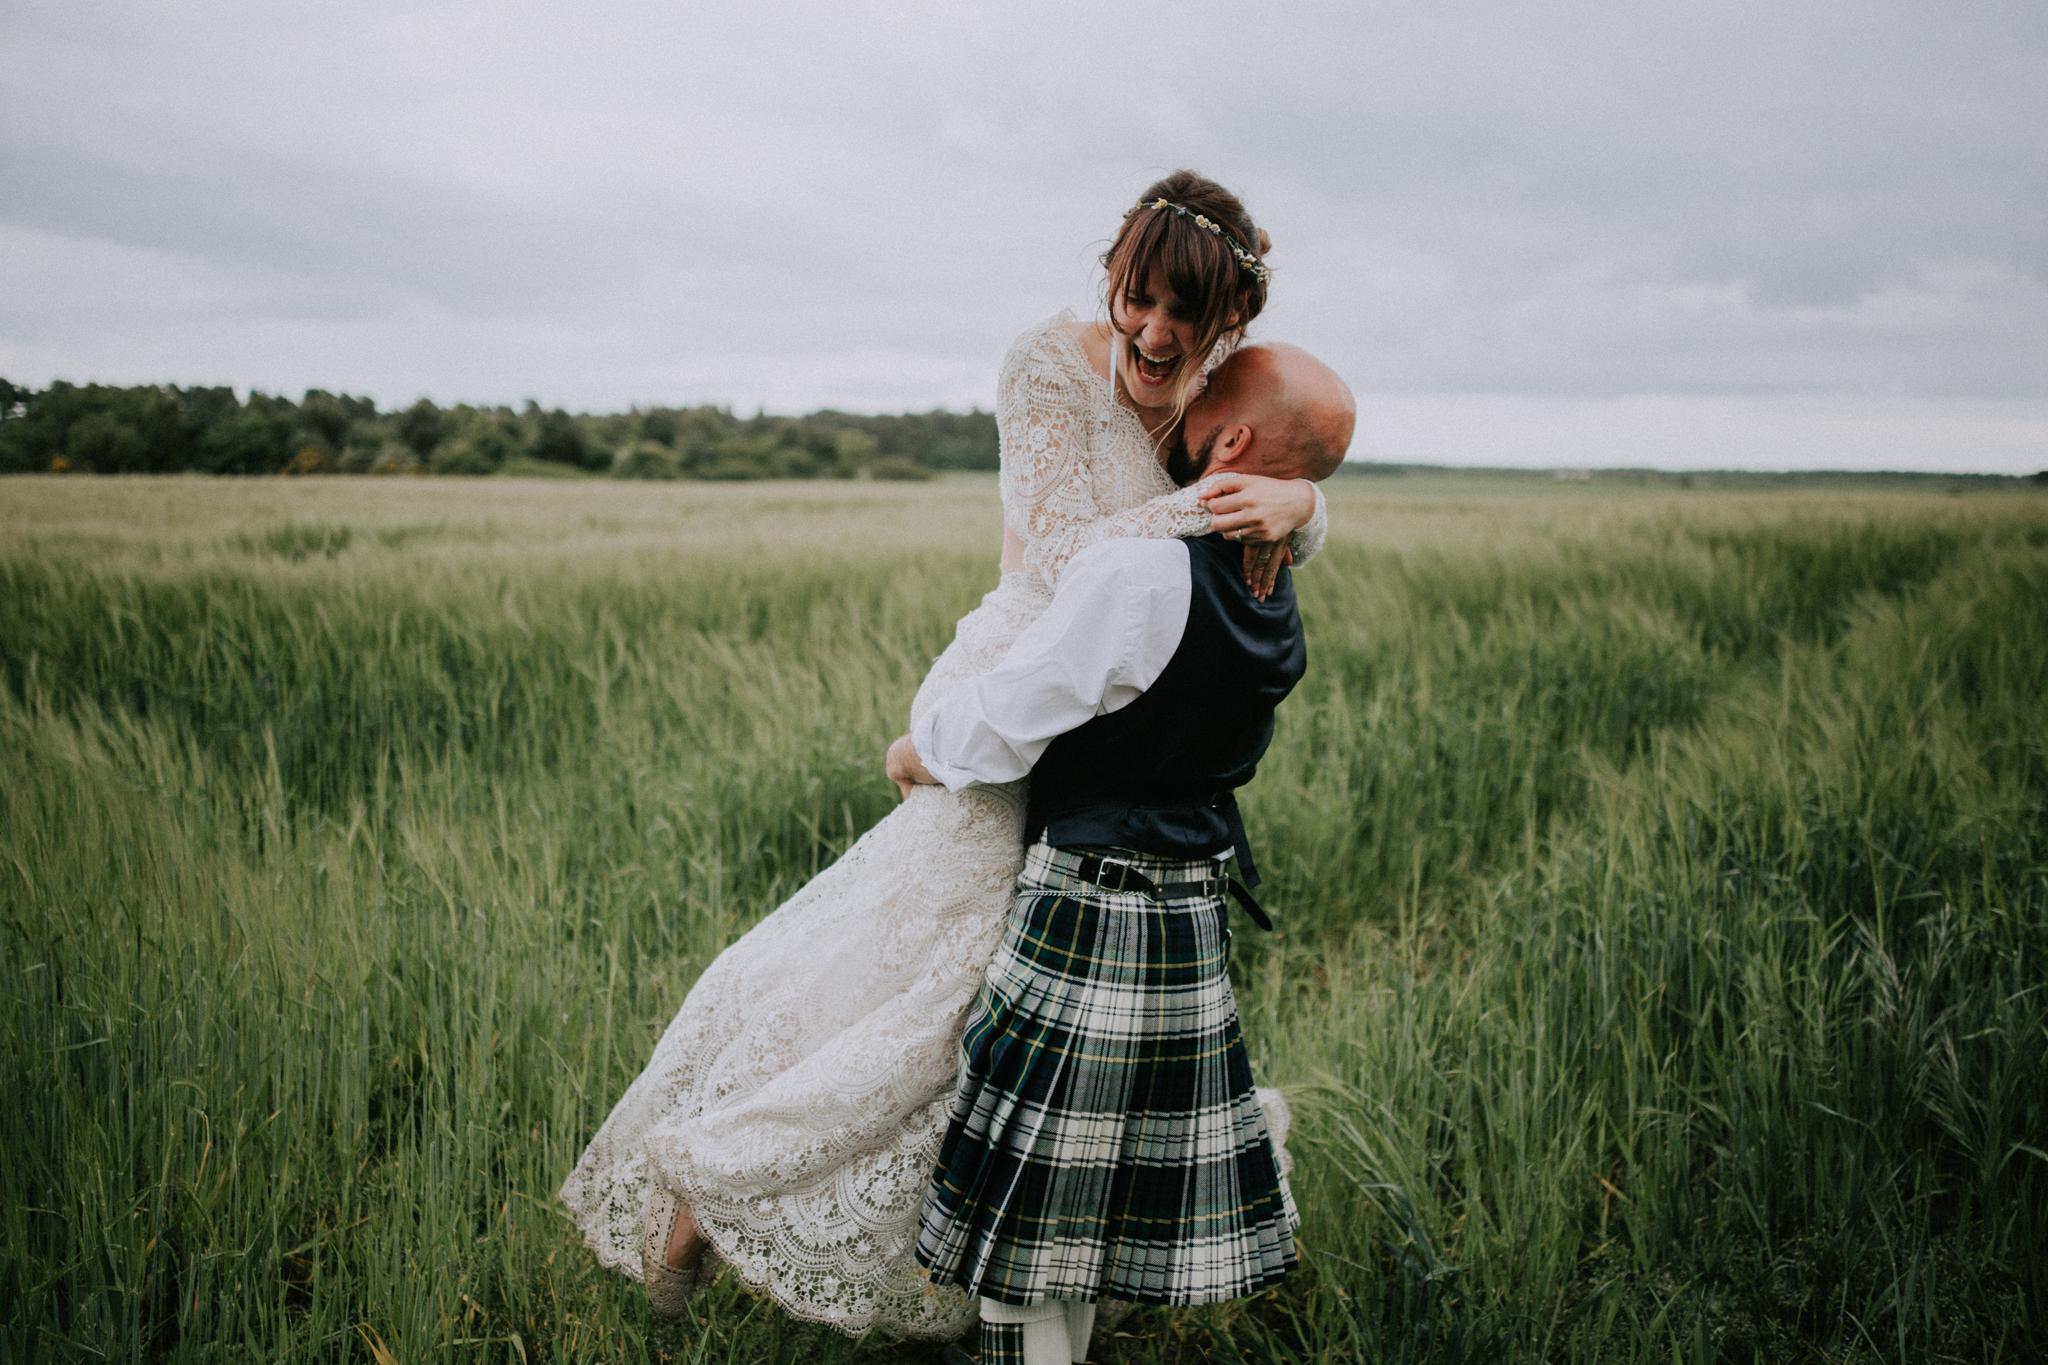 A modern wedding photography